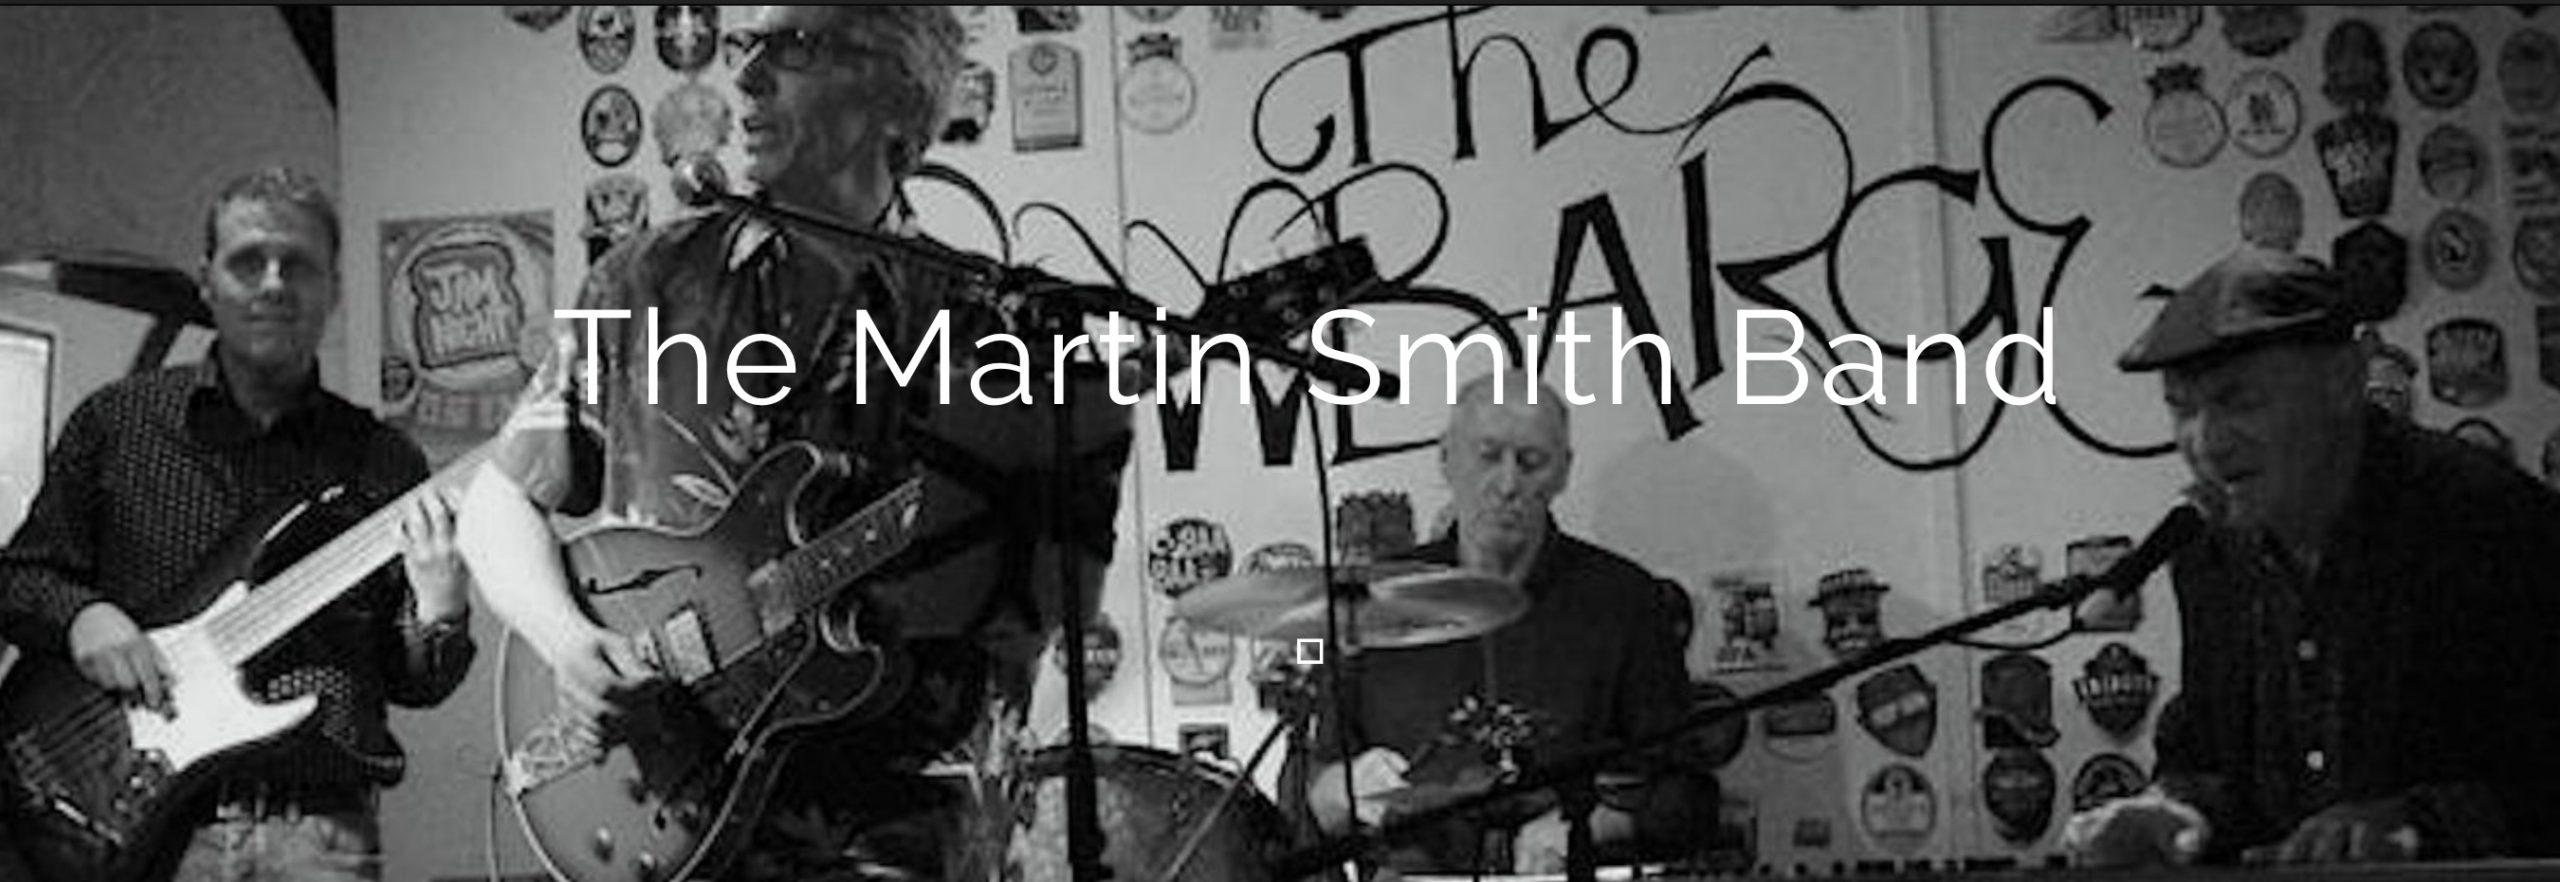 Martin Smith Band website